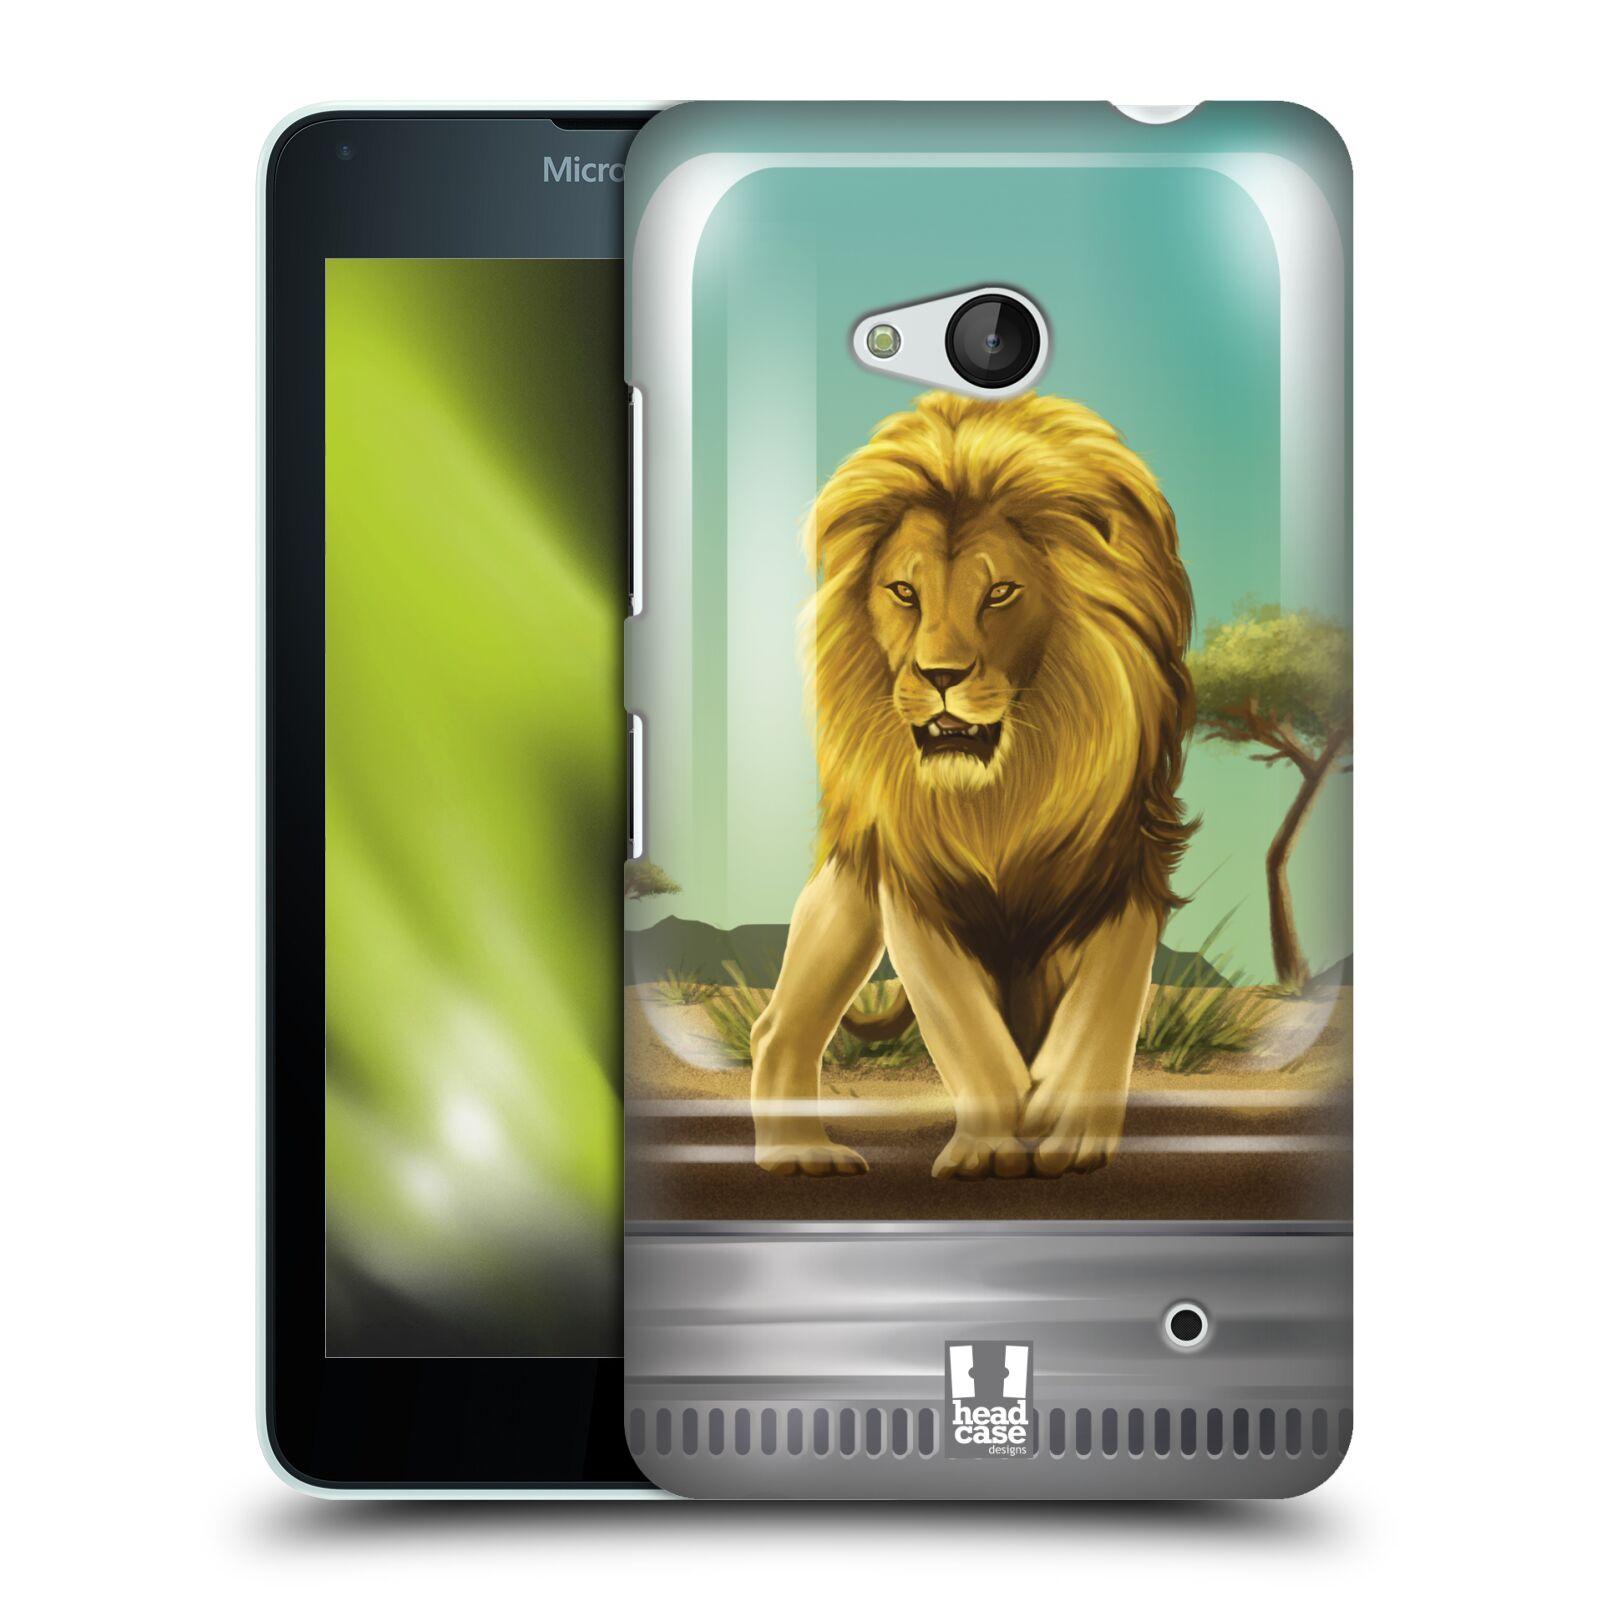 HEAD CASE plastový obal na mobil Nokia Lumia 640 vzor Zvířátka v těžítku lev